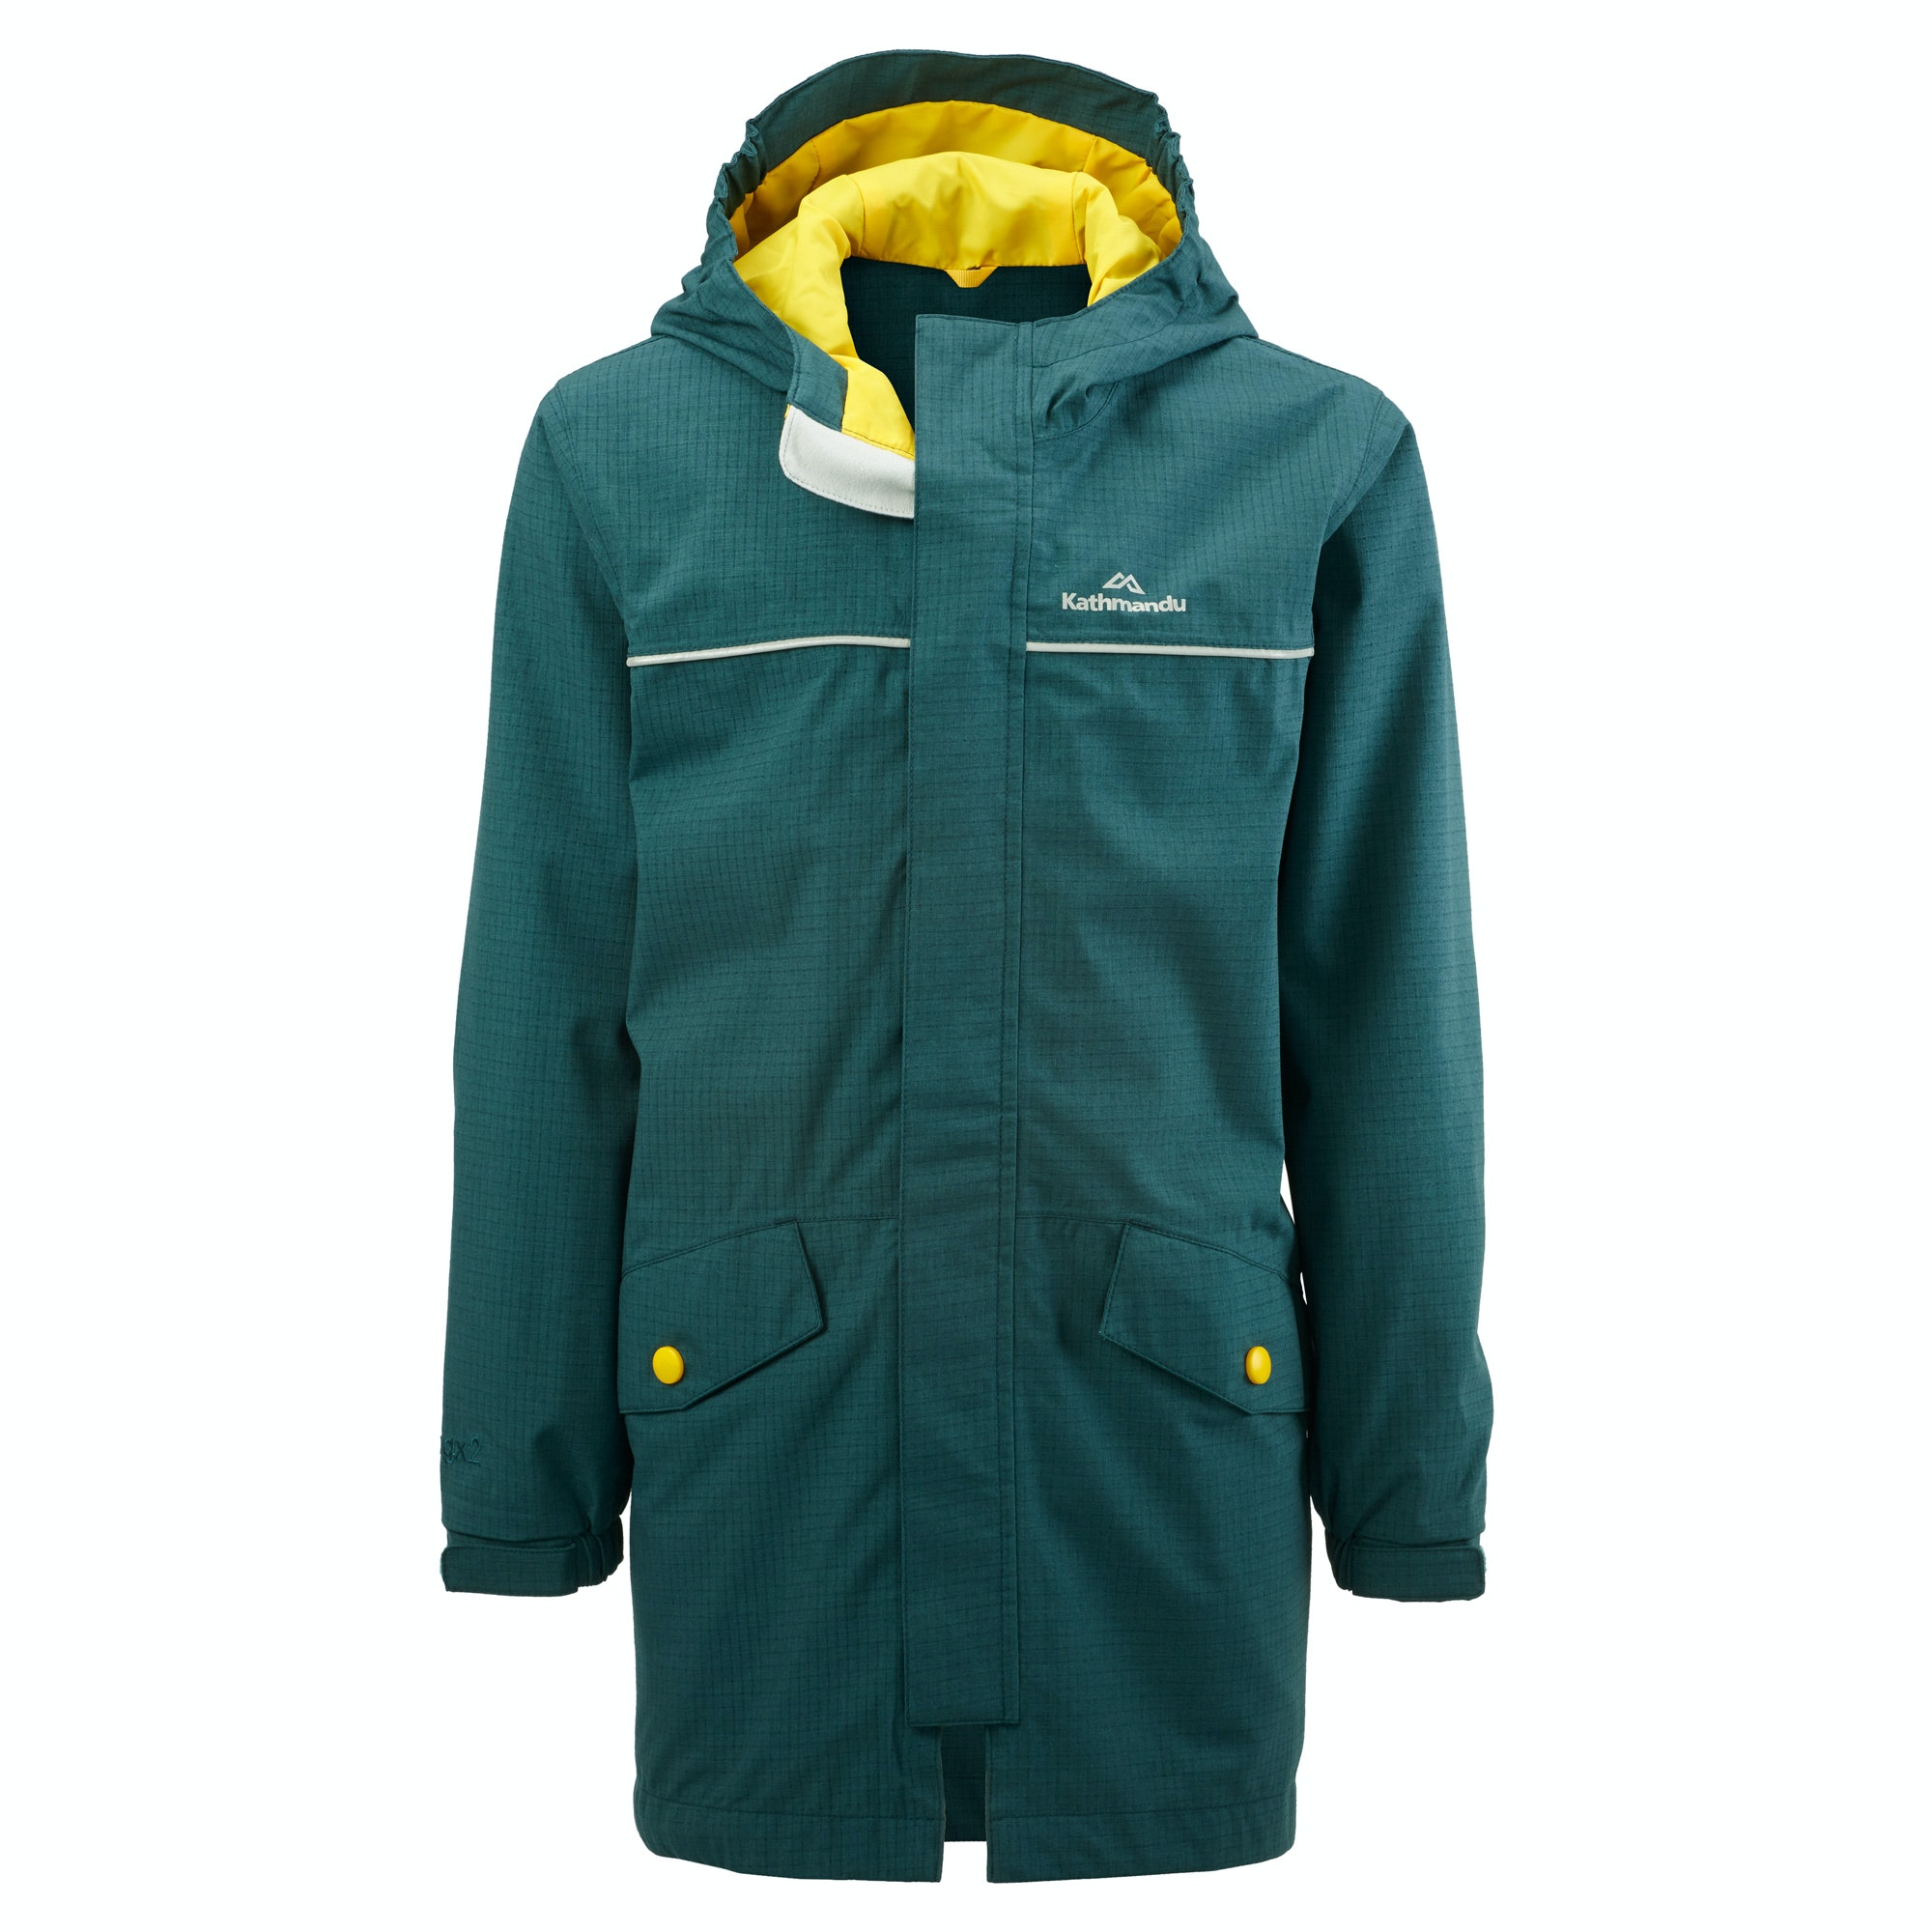 Cloudburst Youth Waterproof Jacket v3 - Pastel Blue